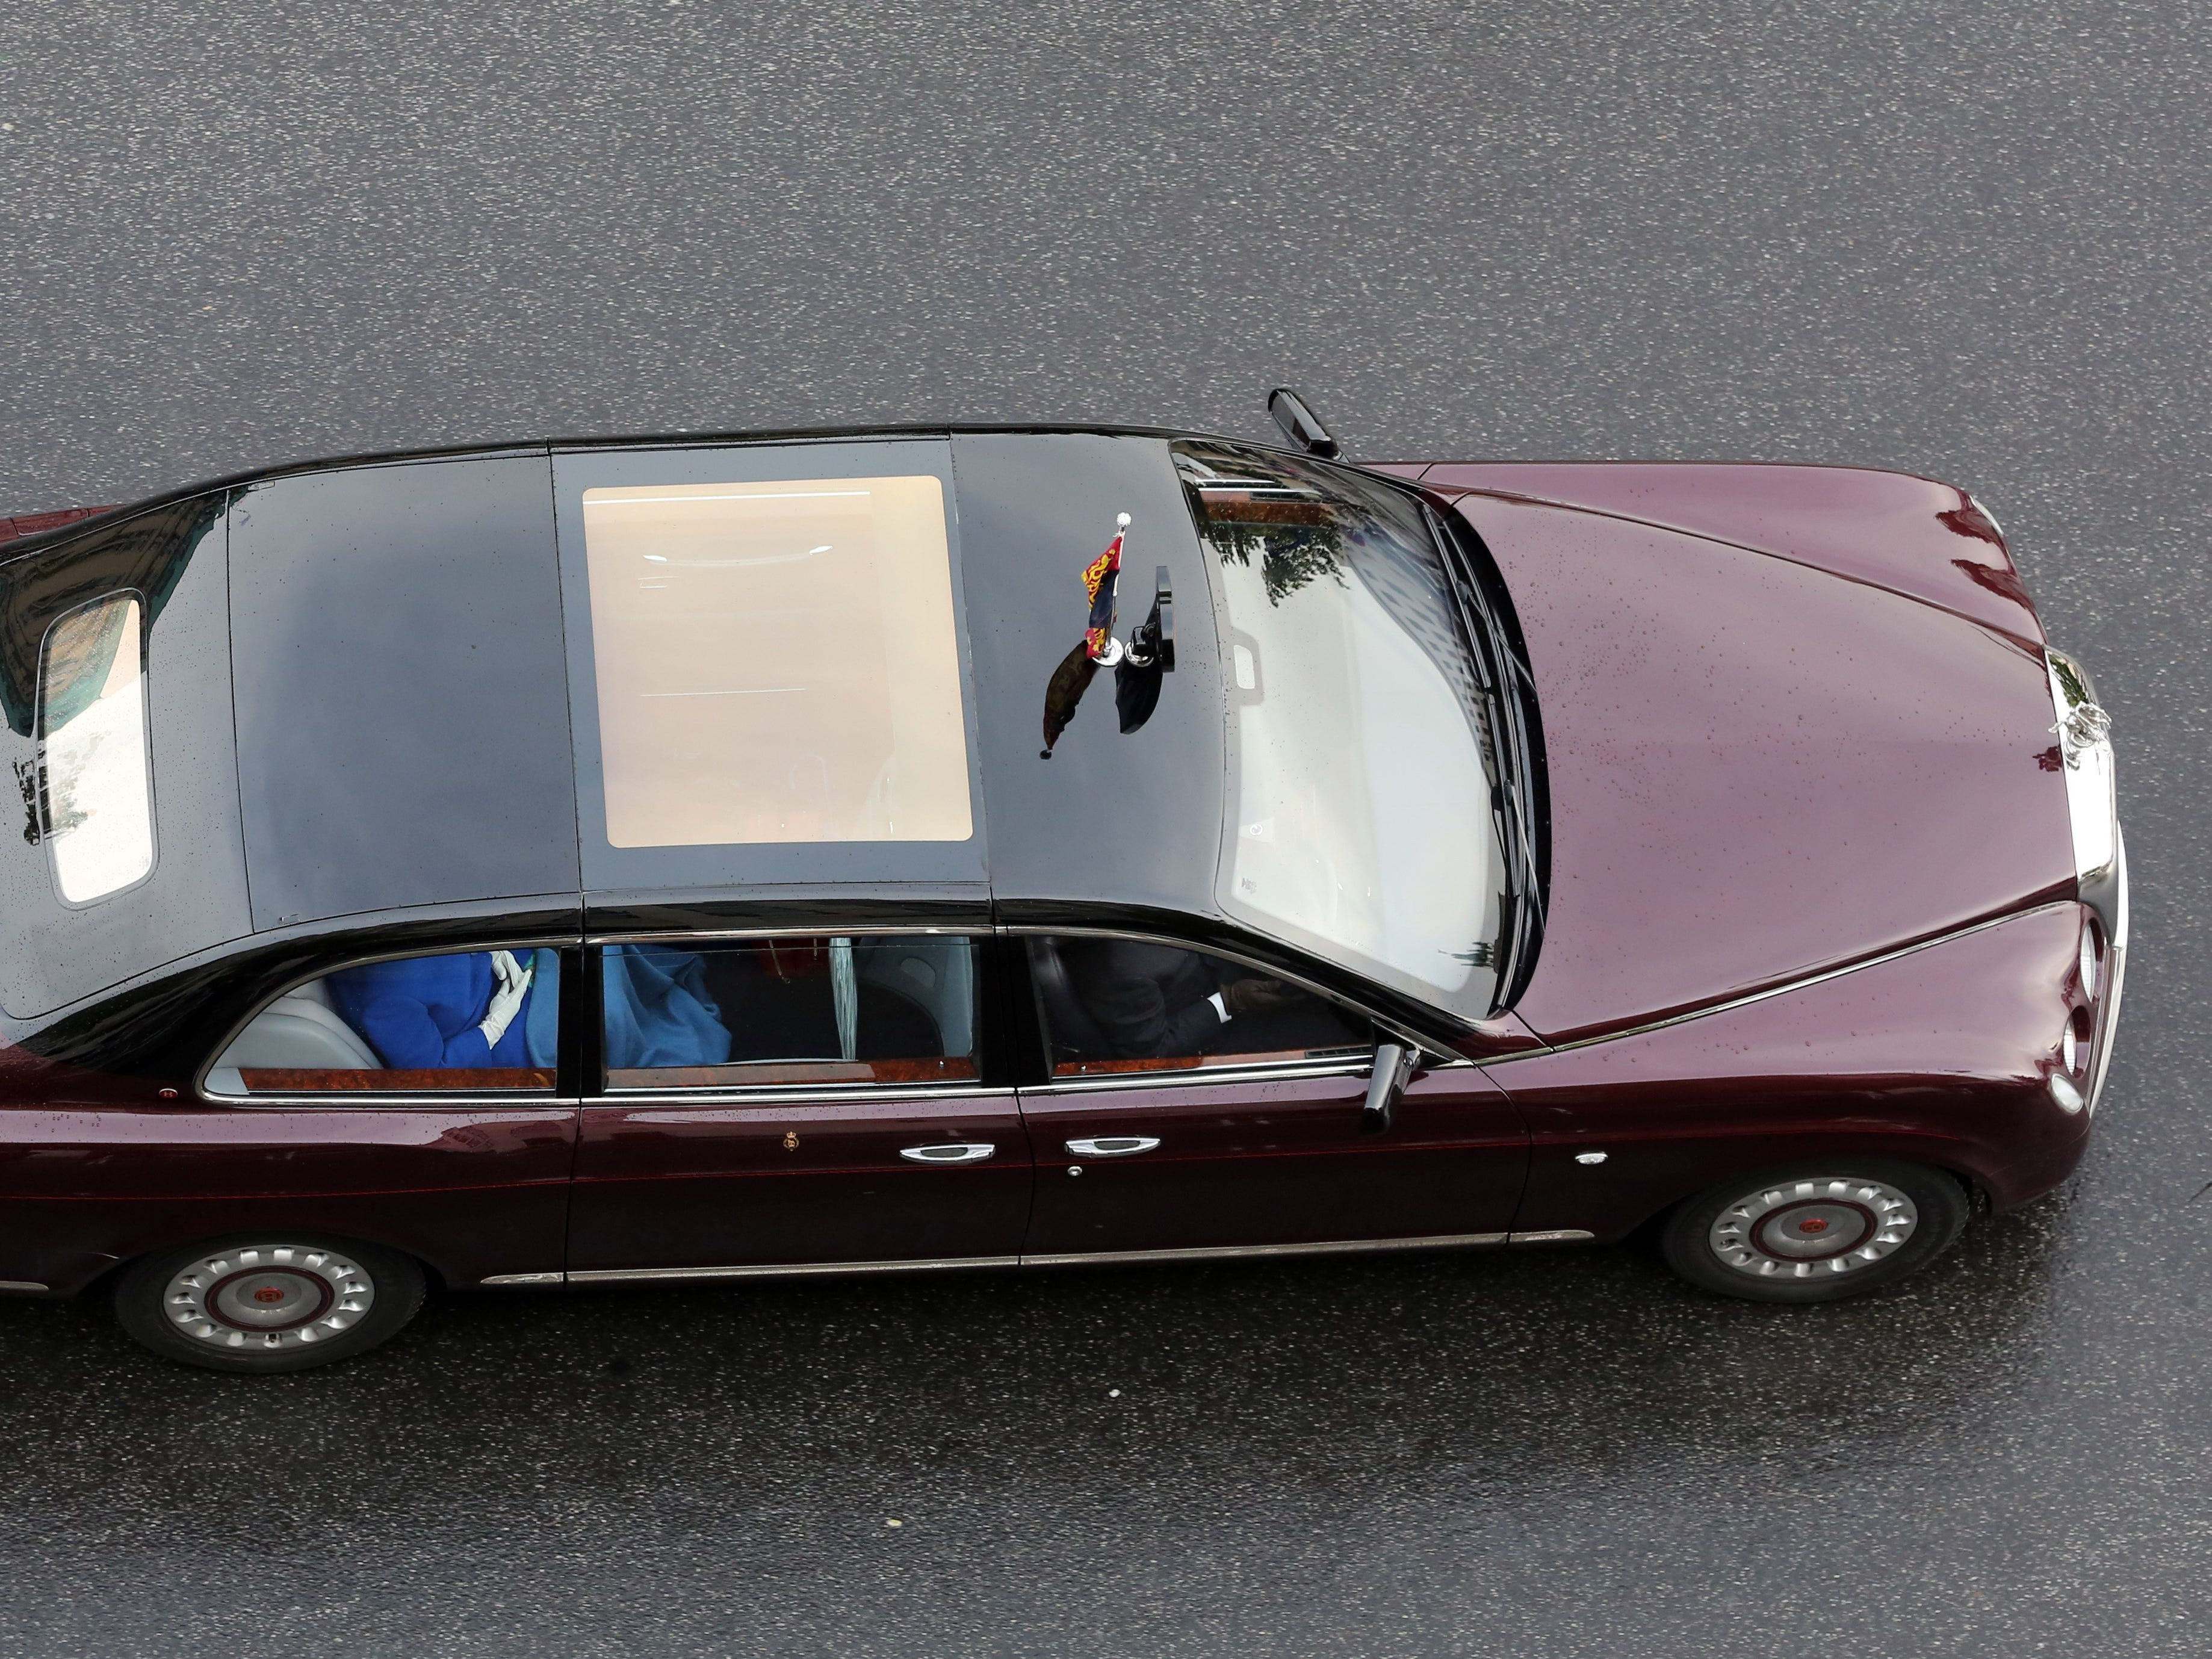 The limousine carries British Queen Elizabeth II and her husband Prince Philip  in Berlin, June 23, 2015.